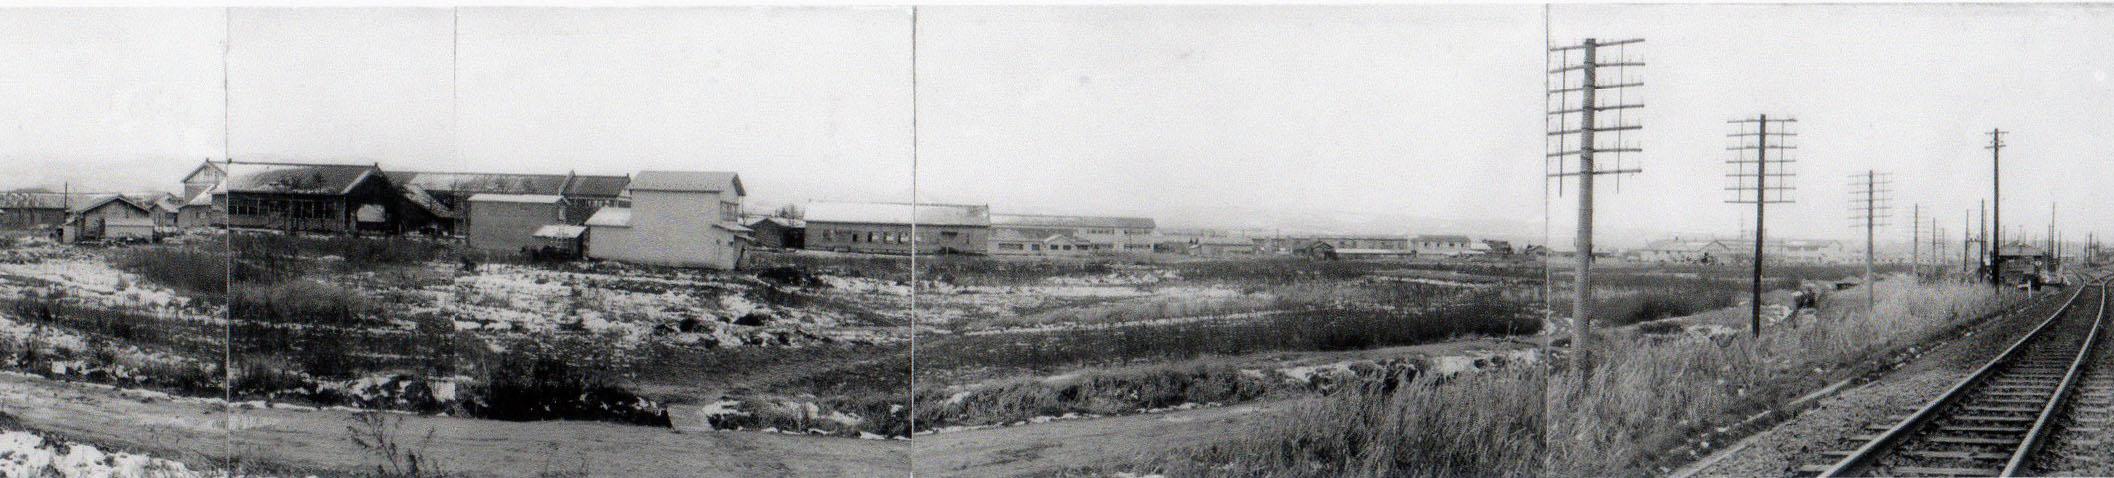 右側には旧浦町駅、左側の建物は松原中学校(阿部秀正氏撮影)